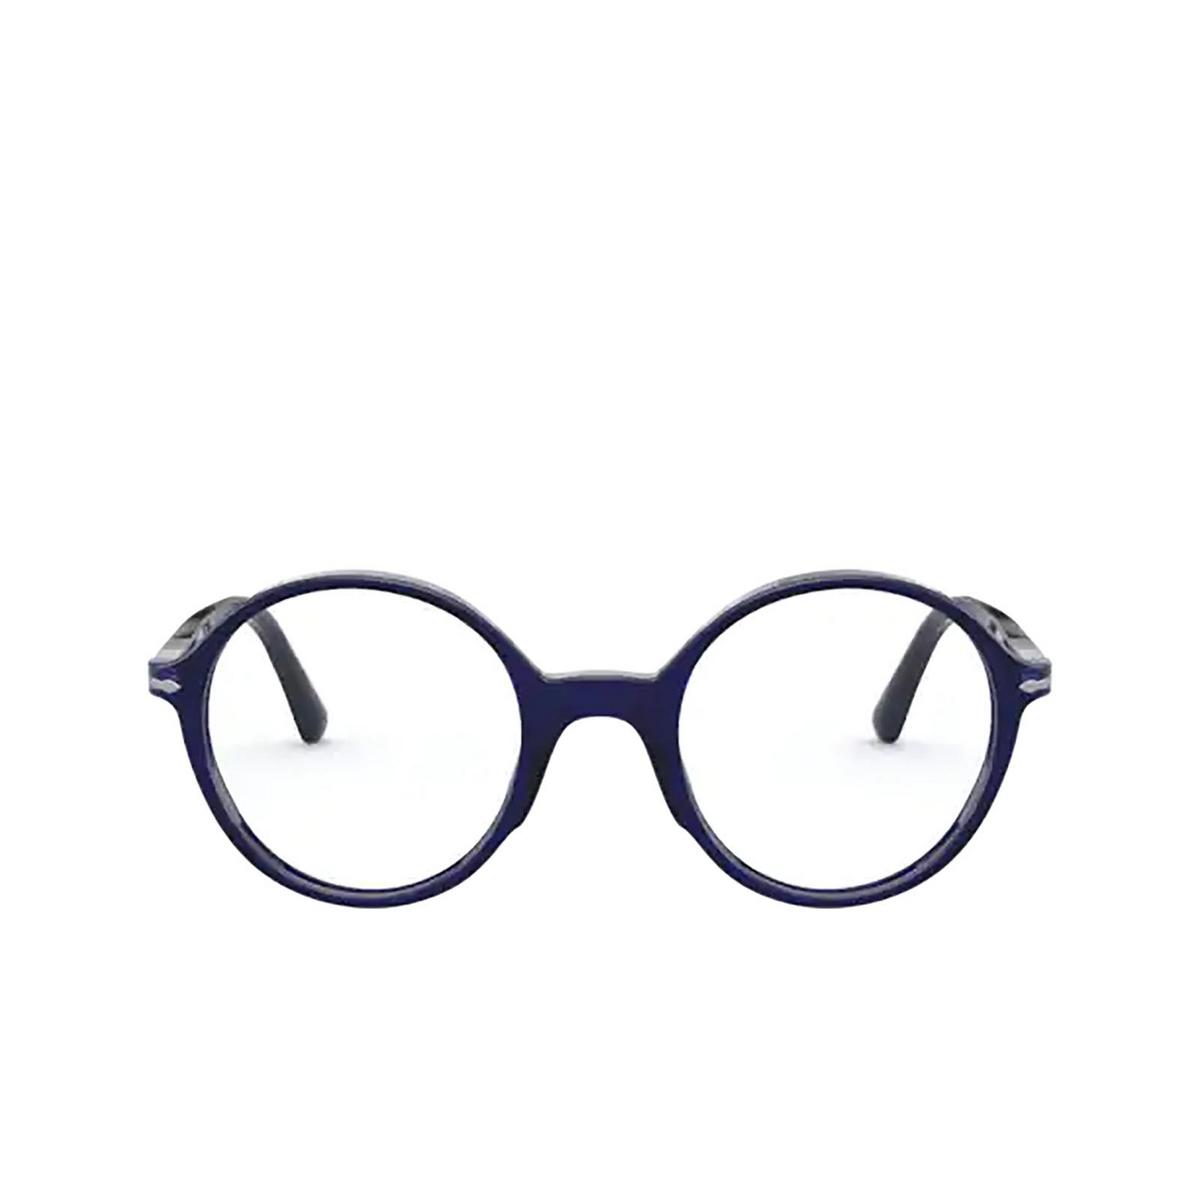 Persol® Round Eyeglasses: PO3249V color Cobalto 181 - front view.